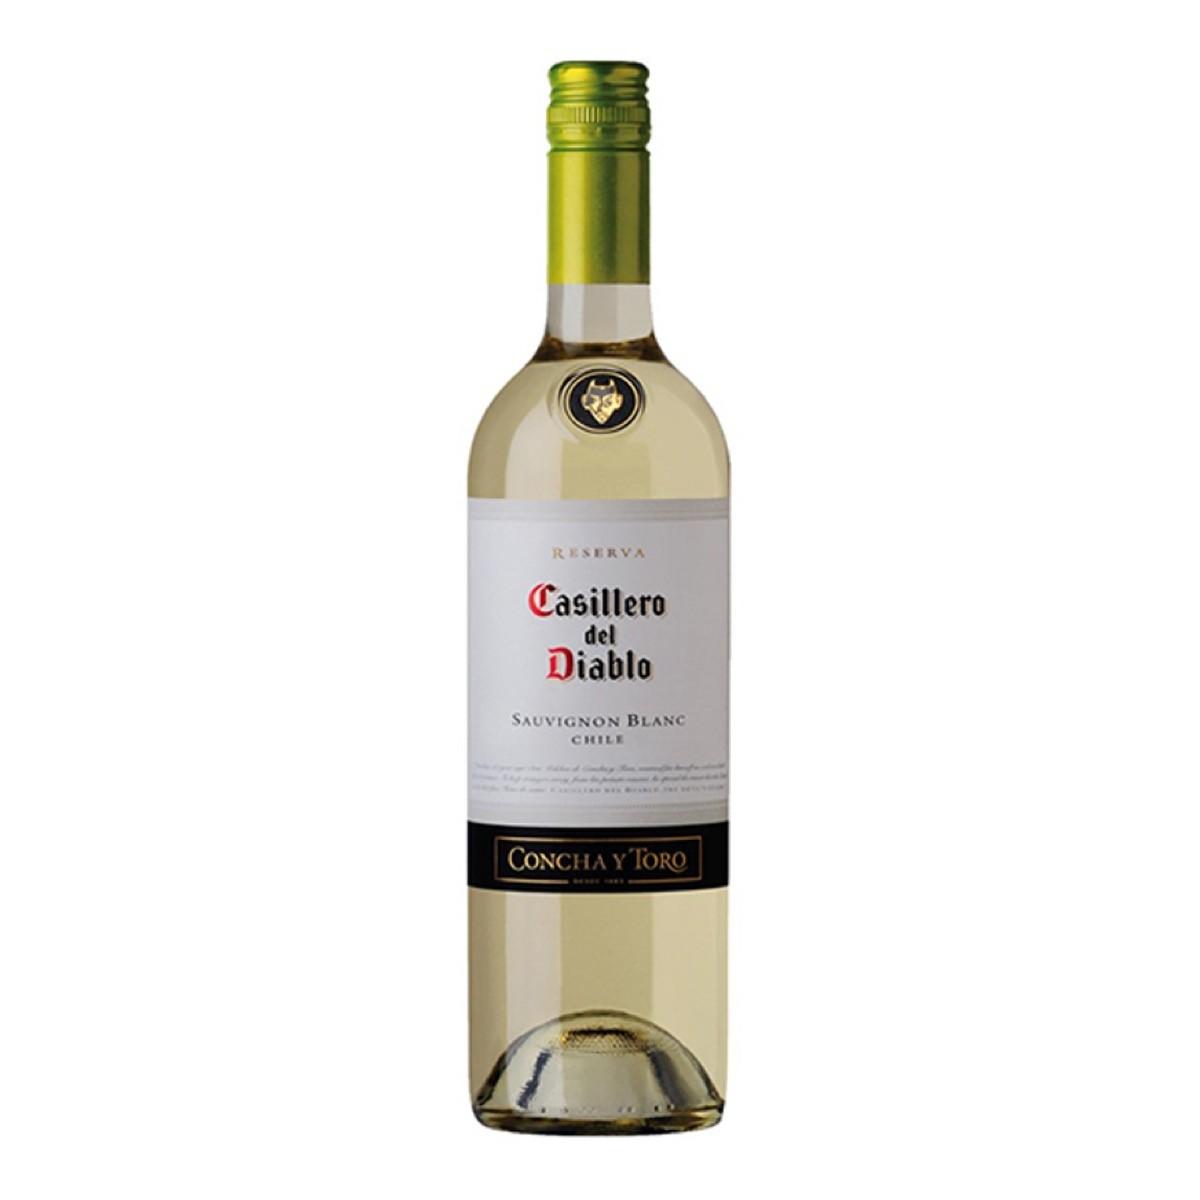 Concha Y Toro Casillero del Diablo Sauvignon Blanc 2020